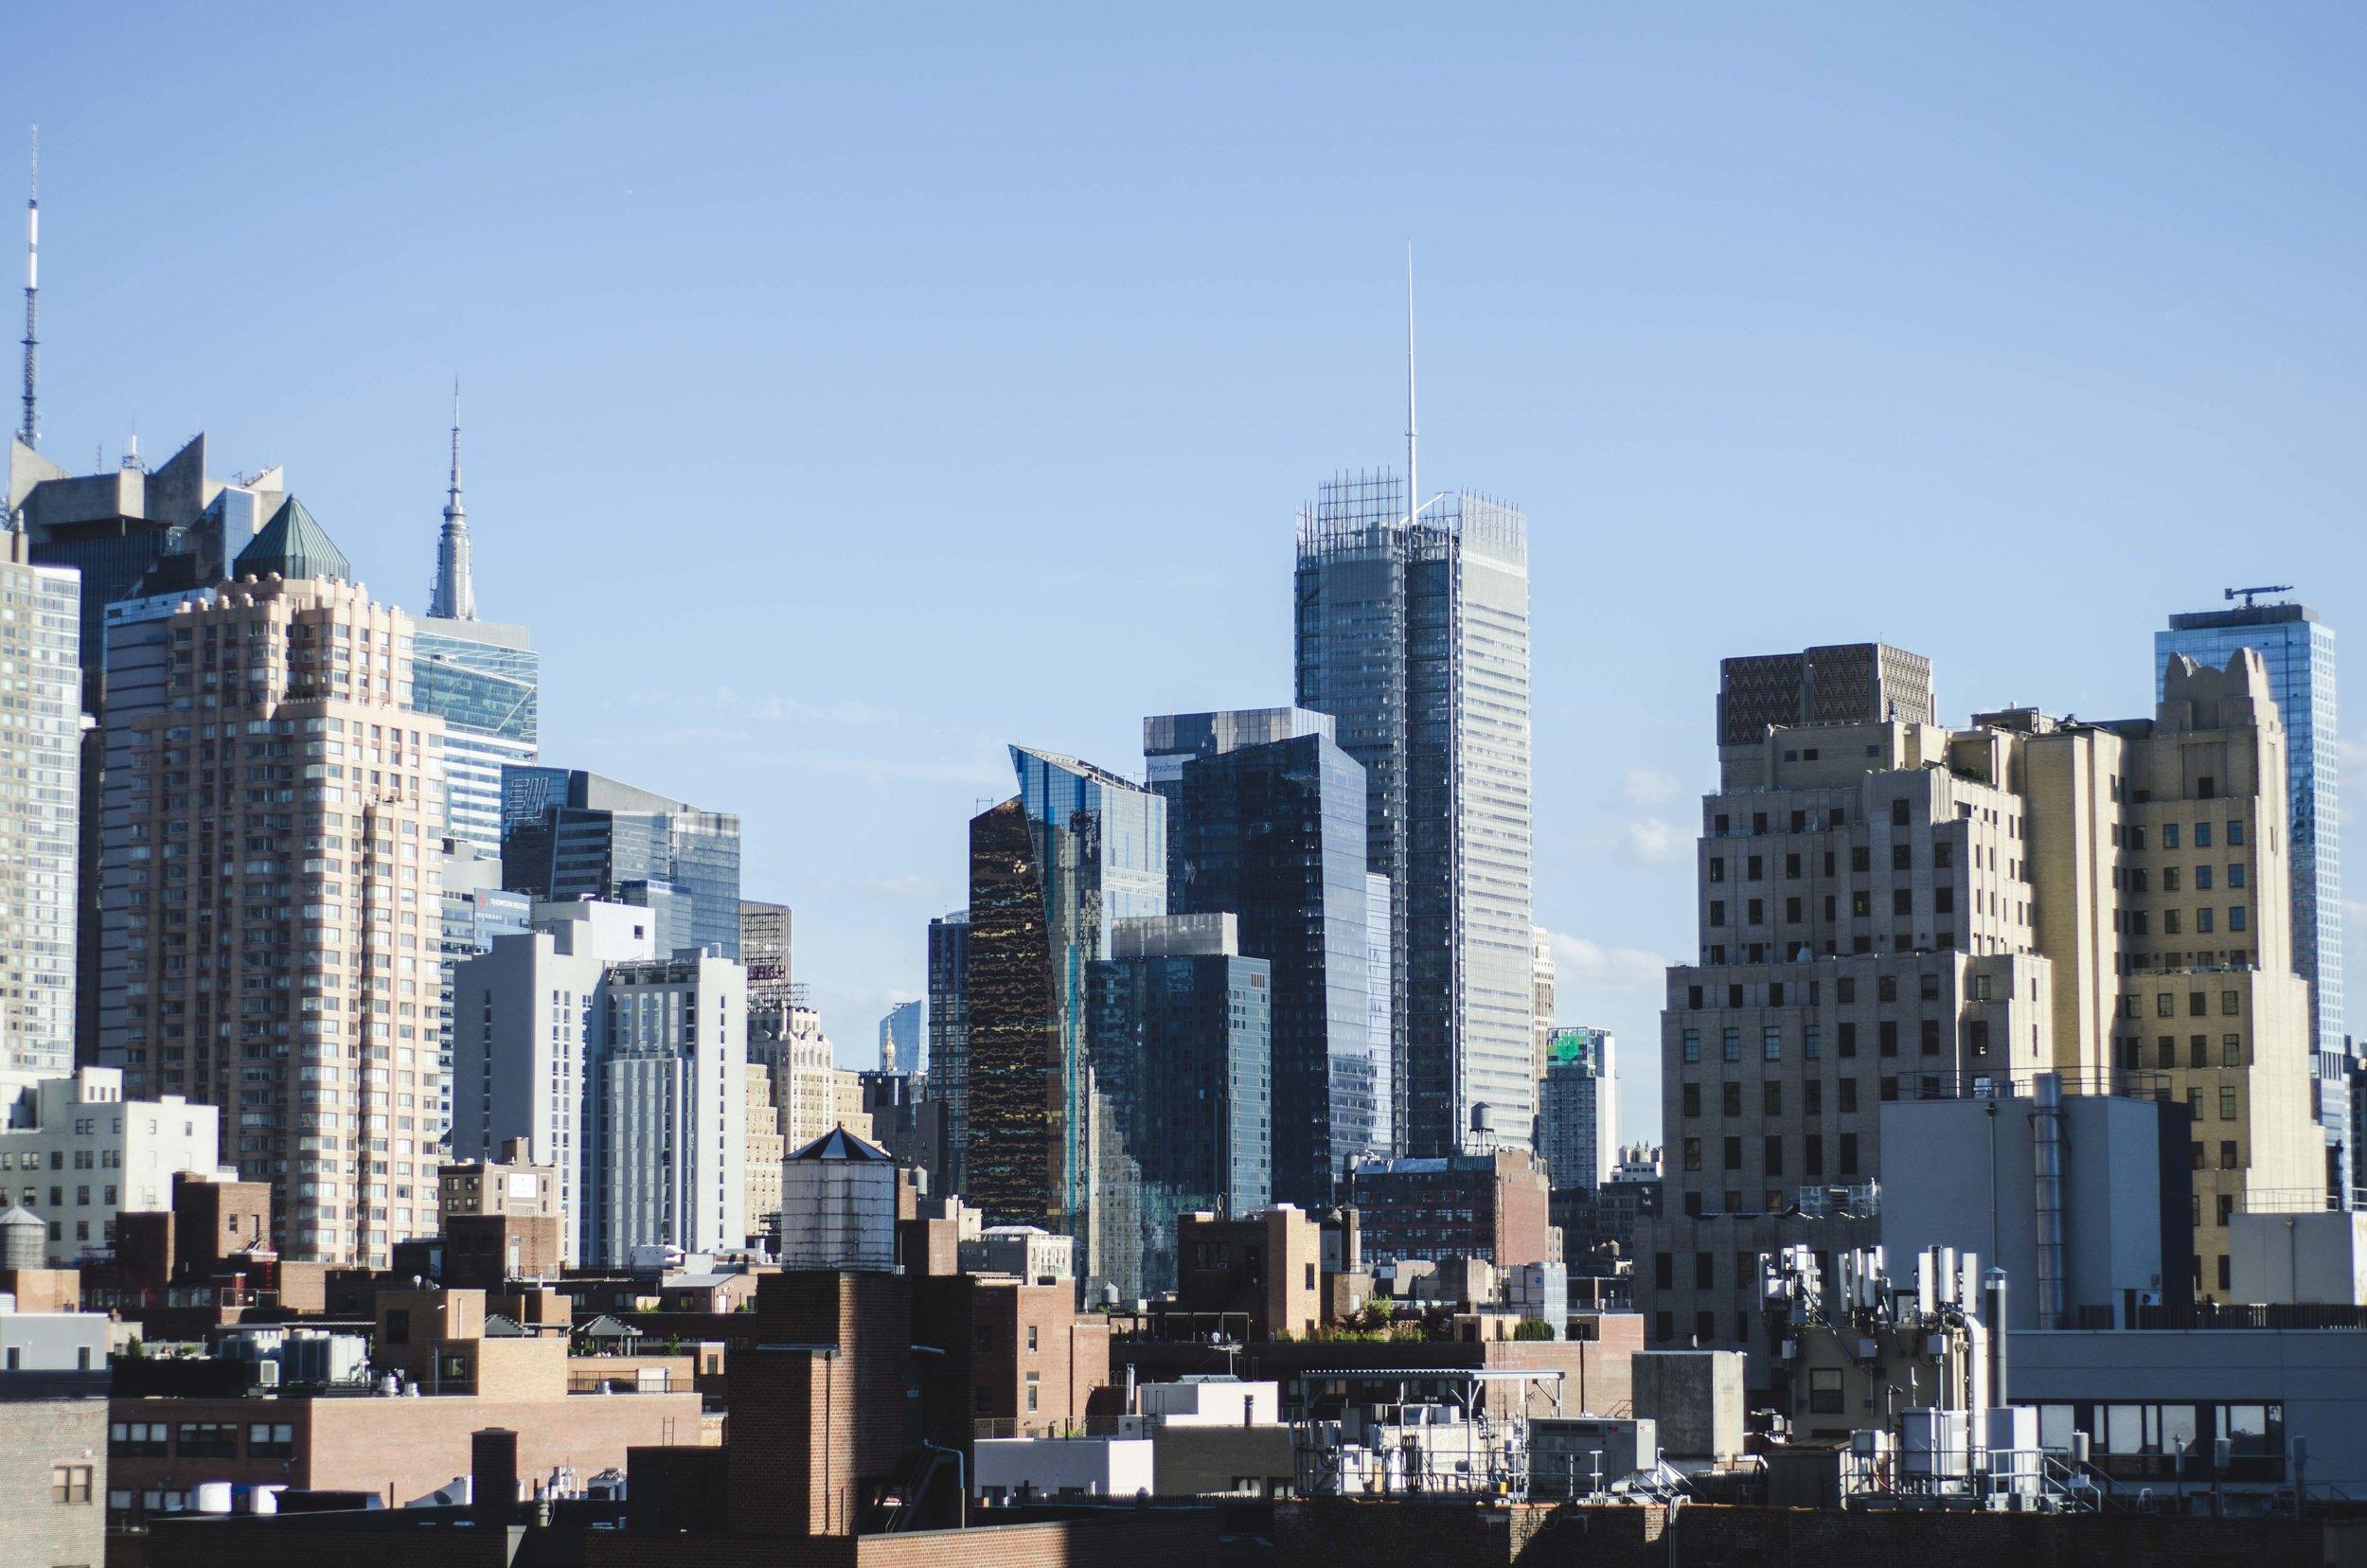 NYC_26.jpg